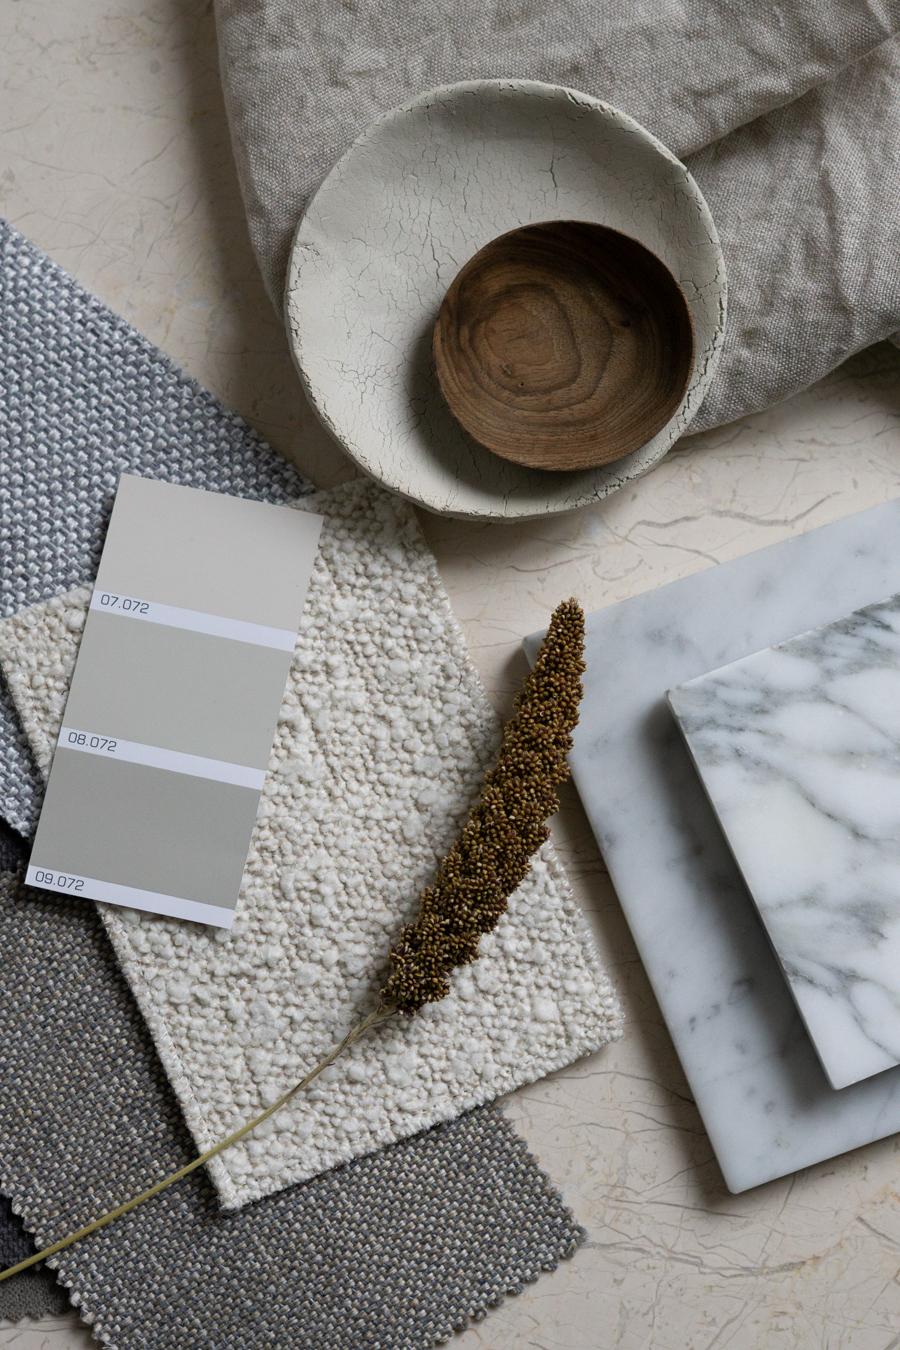 SOFACOMPANY Fabric Samples Interior Design